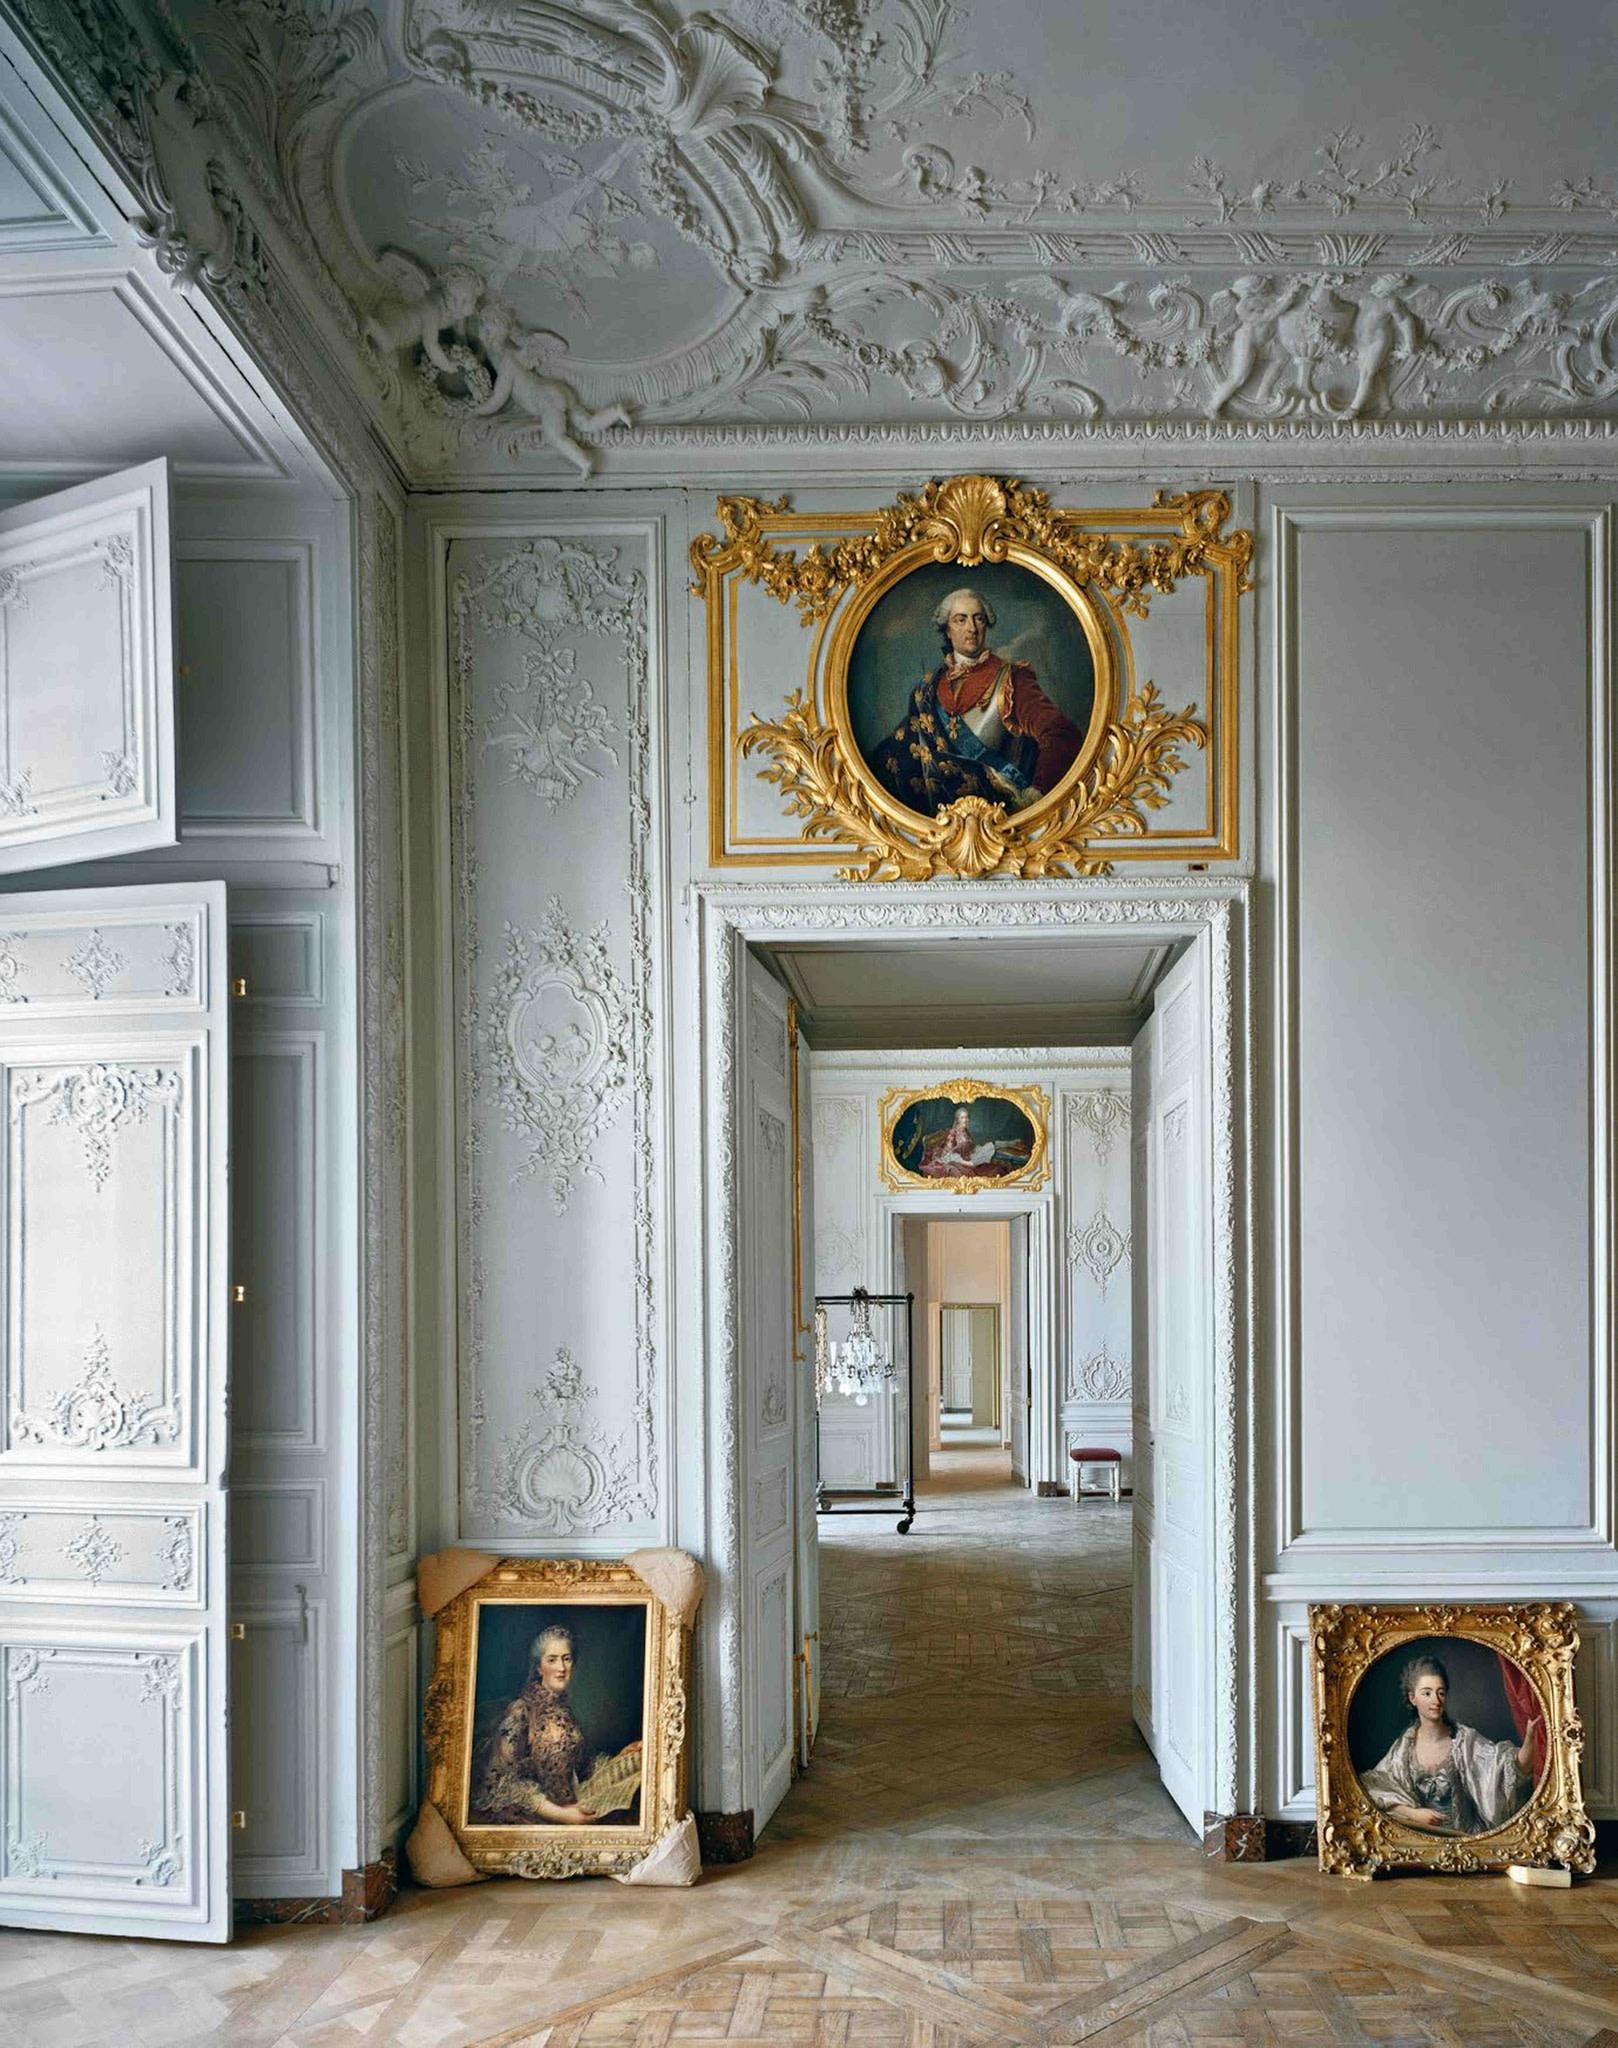 Robert Polidori Robert Polidori Grand cabinet de